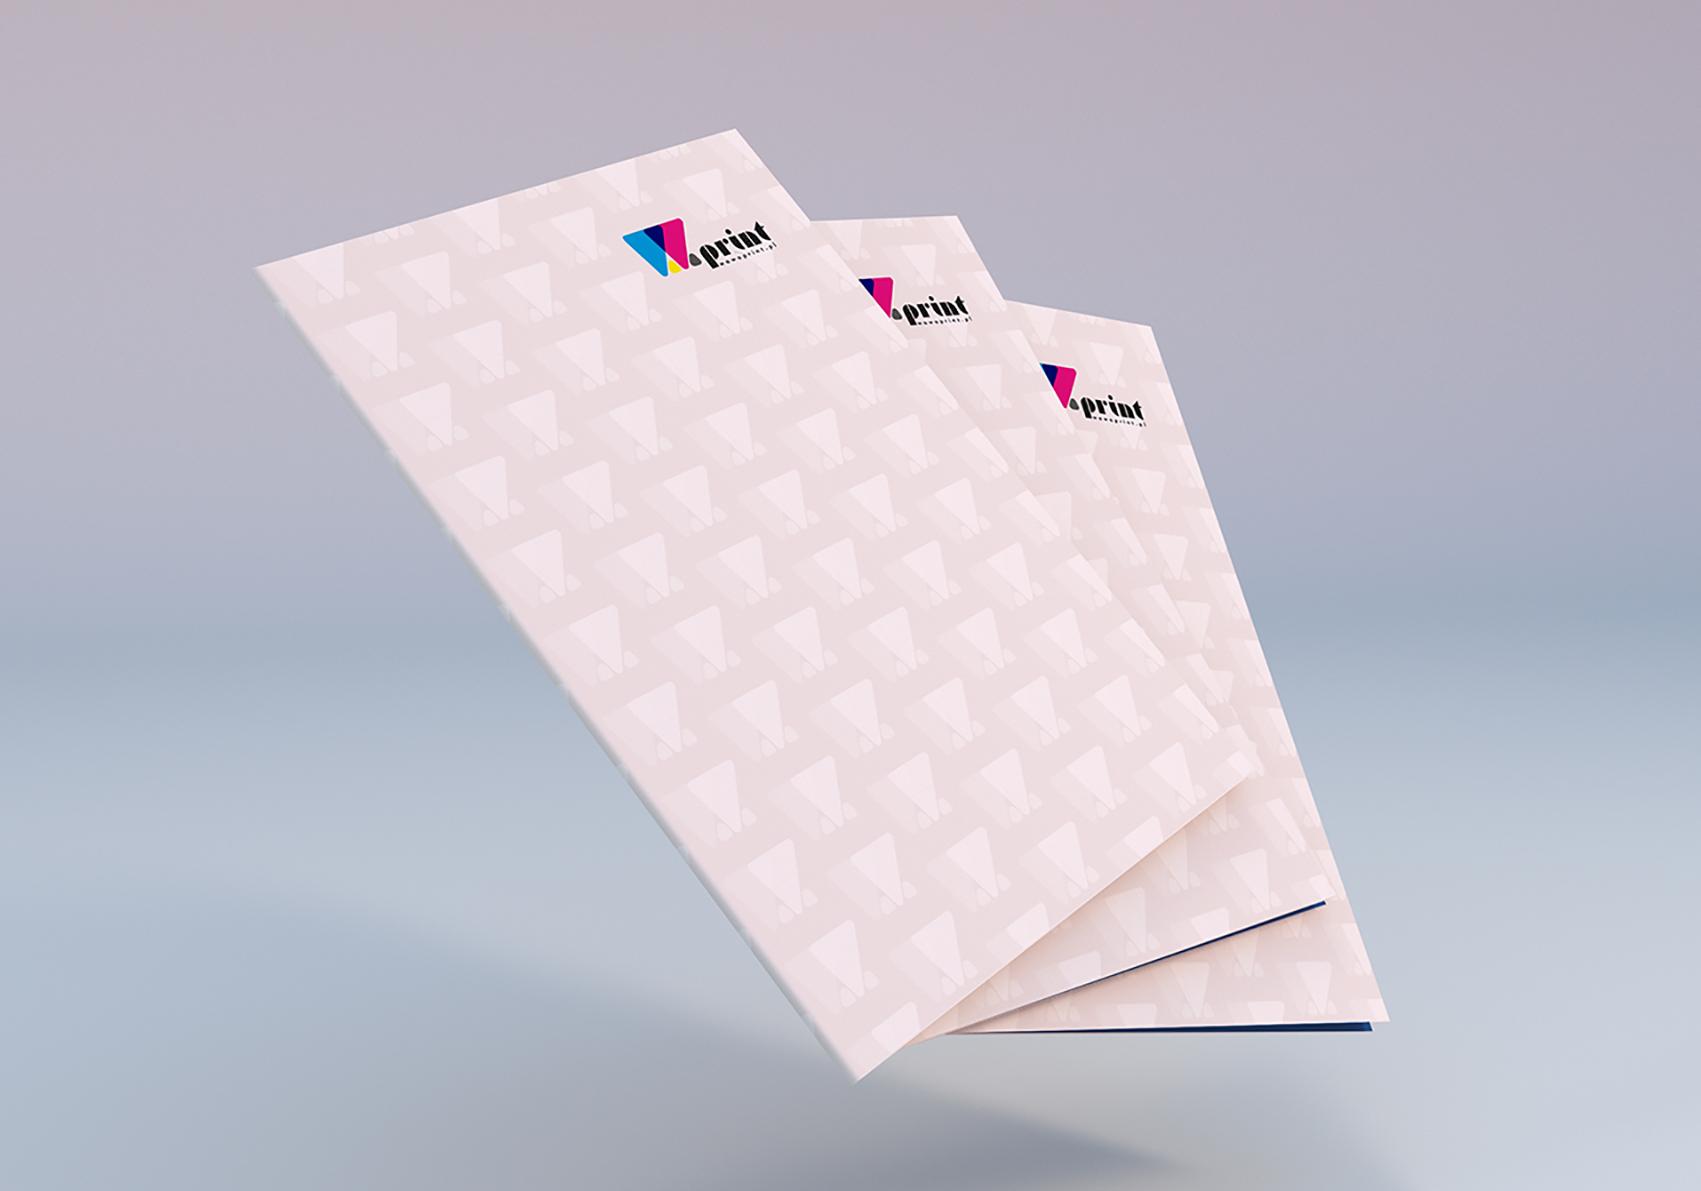 Foldery reklamowe_image2